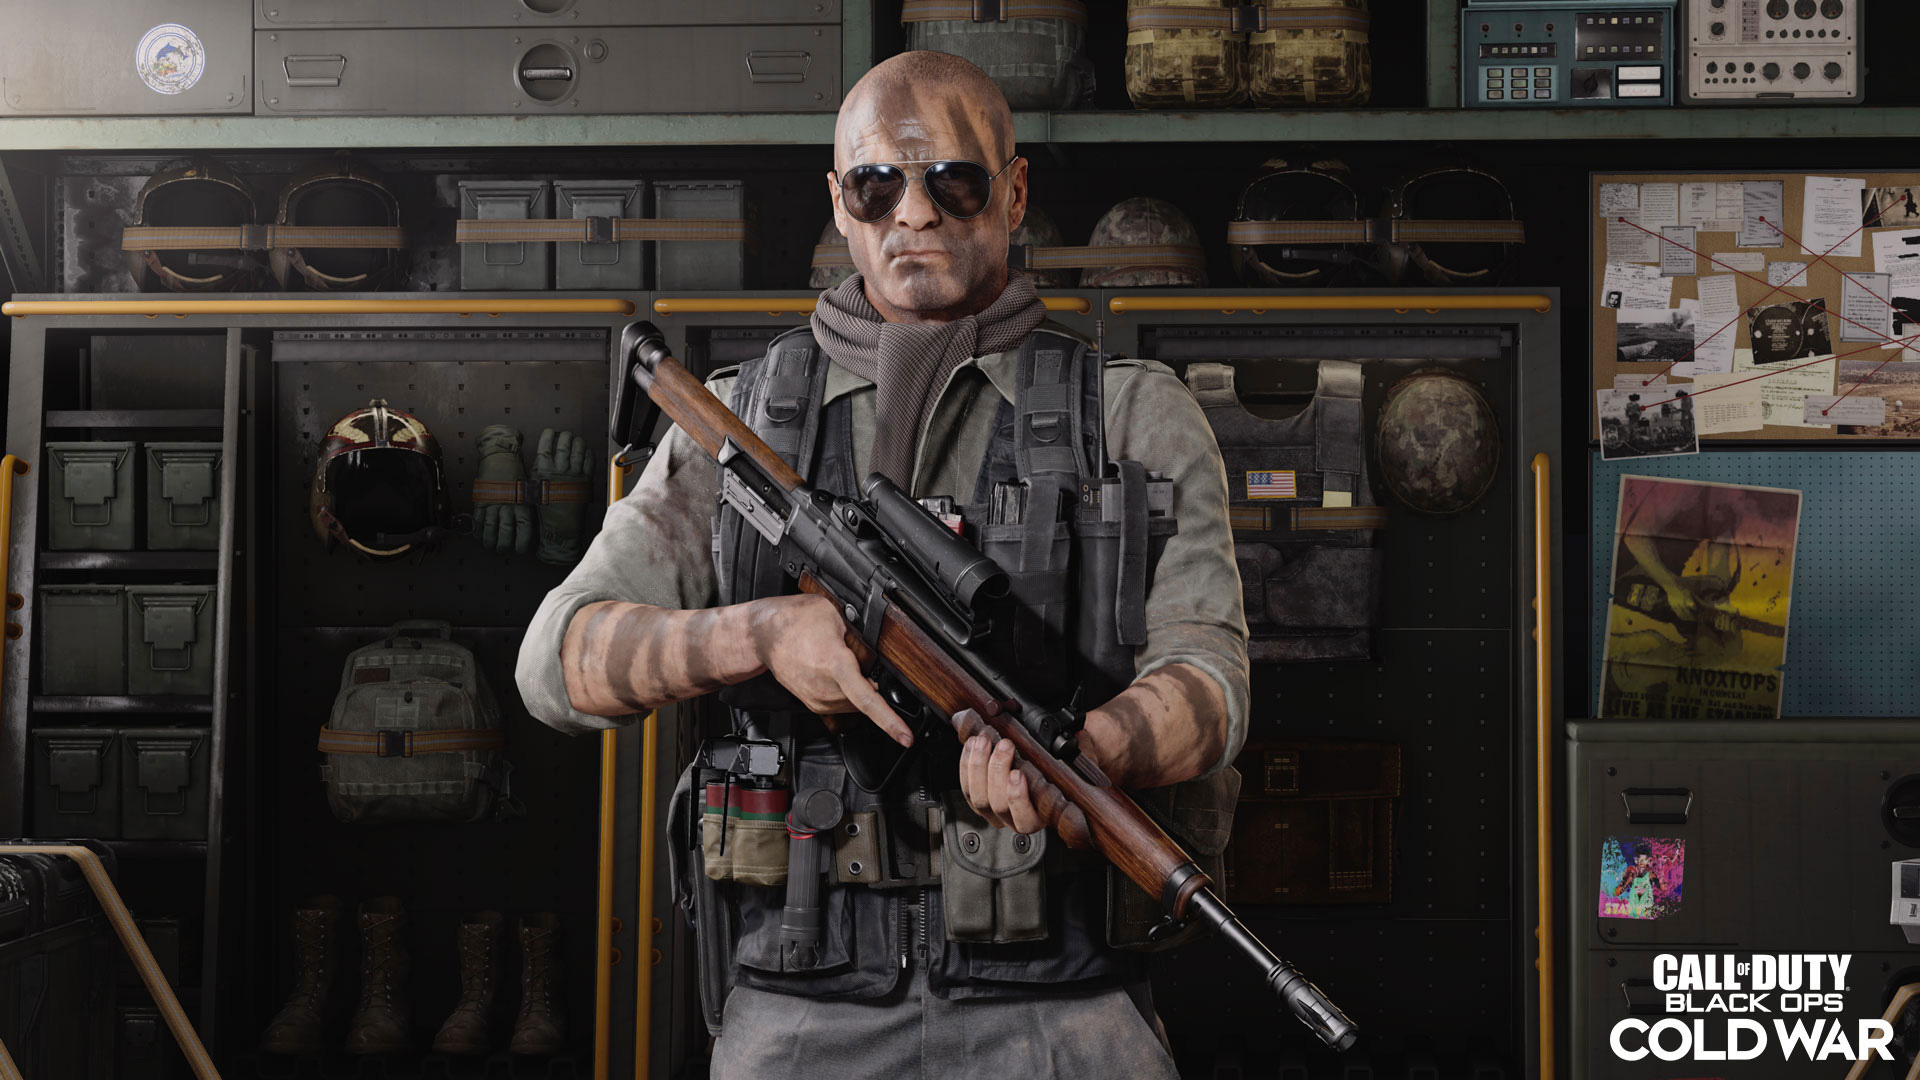 Warzone operator Hudson poses ahead of Season 5 Reloaded